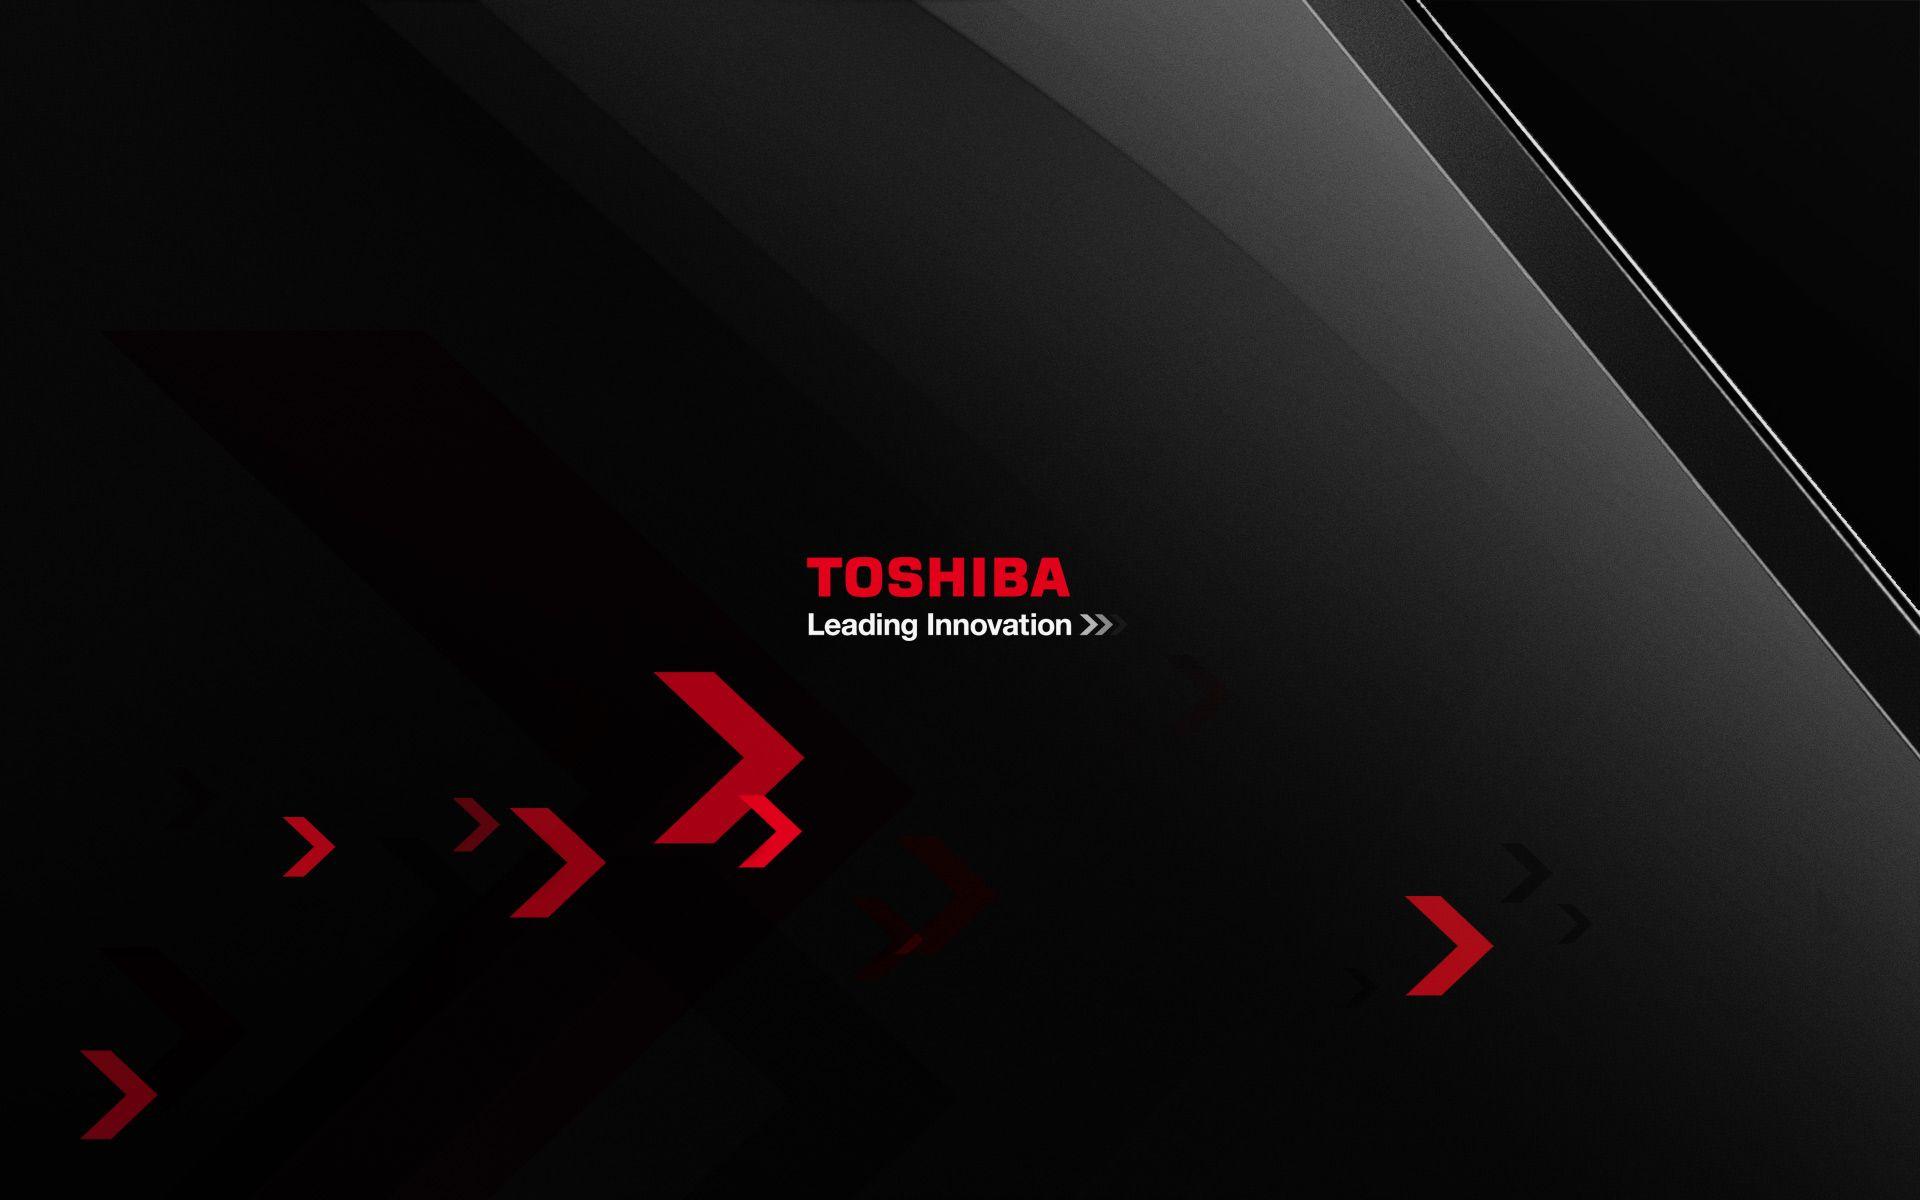 Toshiba-Desktop-Backgrounds-wallpaper-wpc5809652